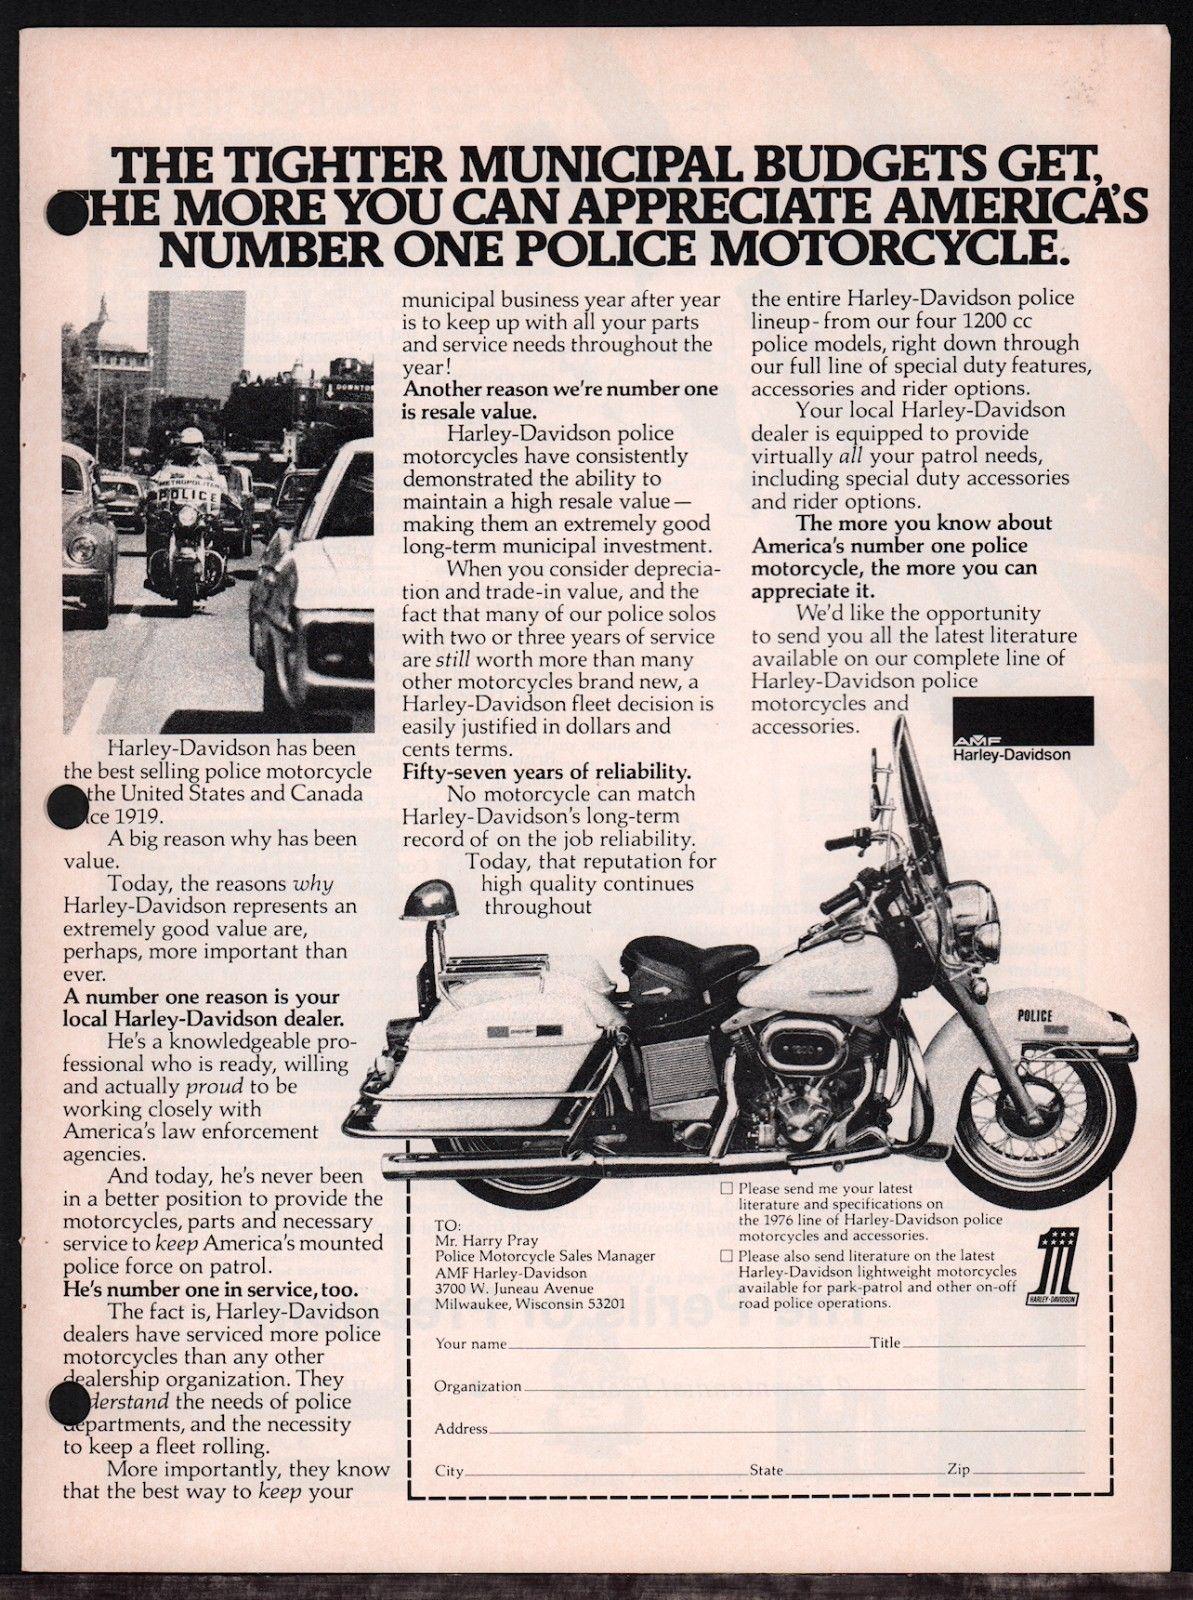 Anuncio de modelo de Policía de 1976